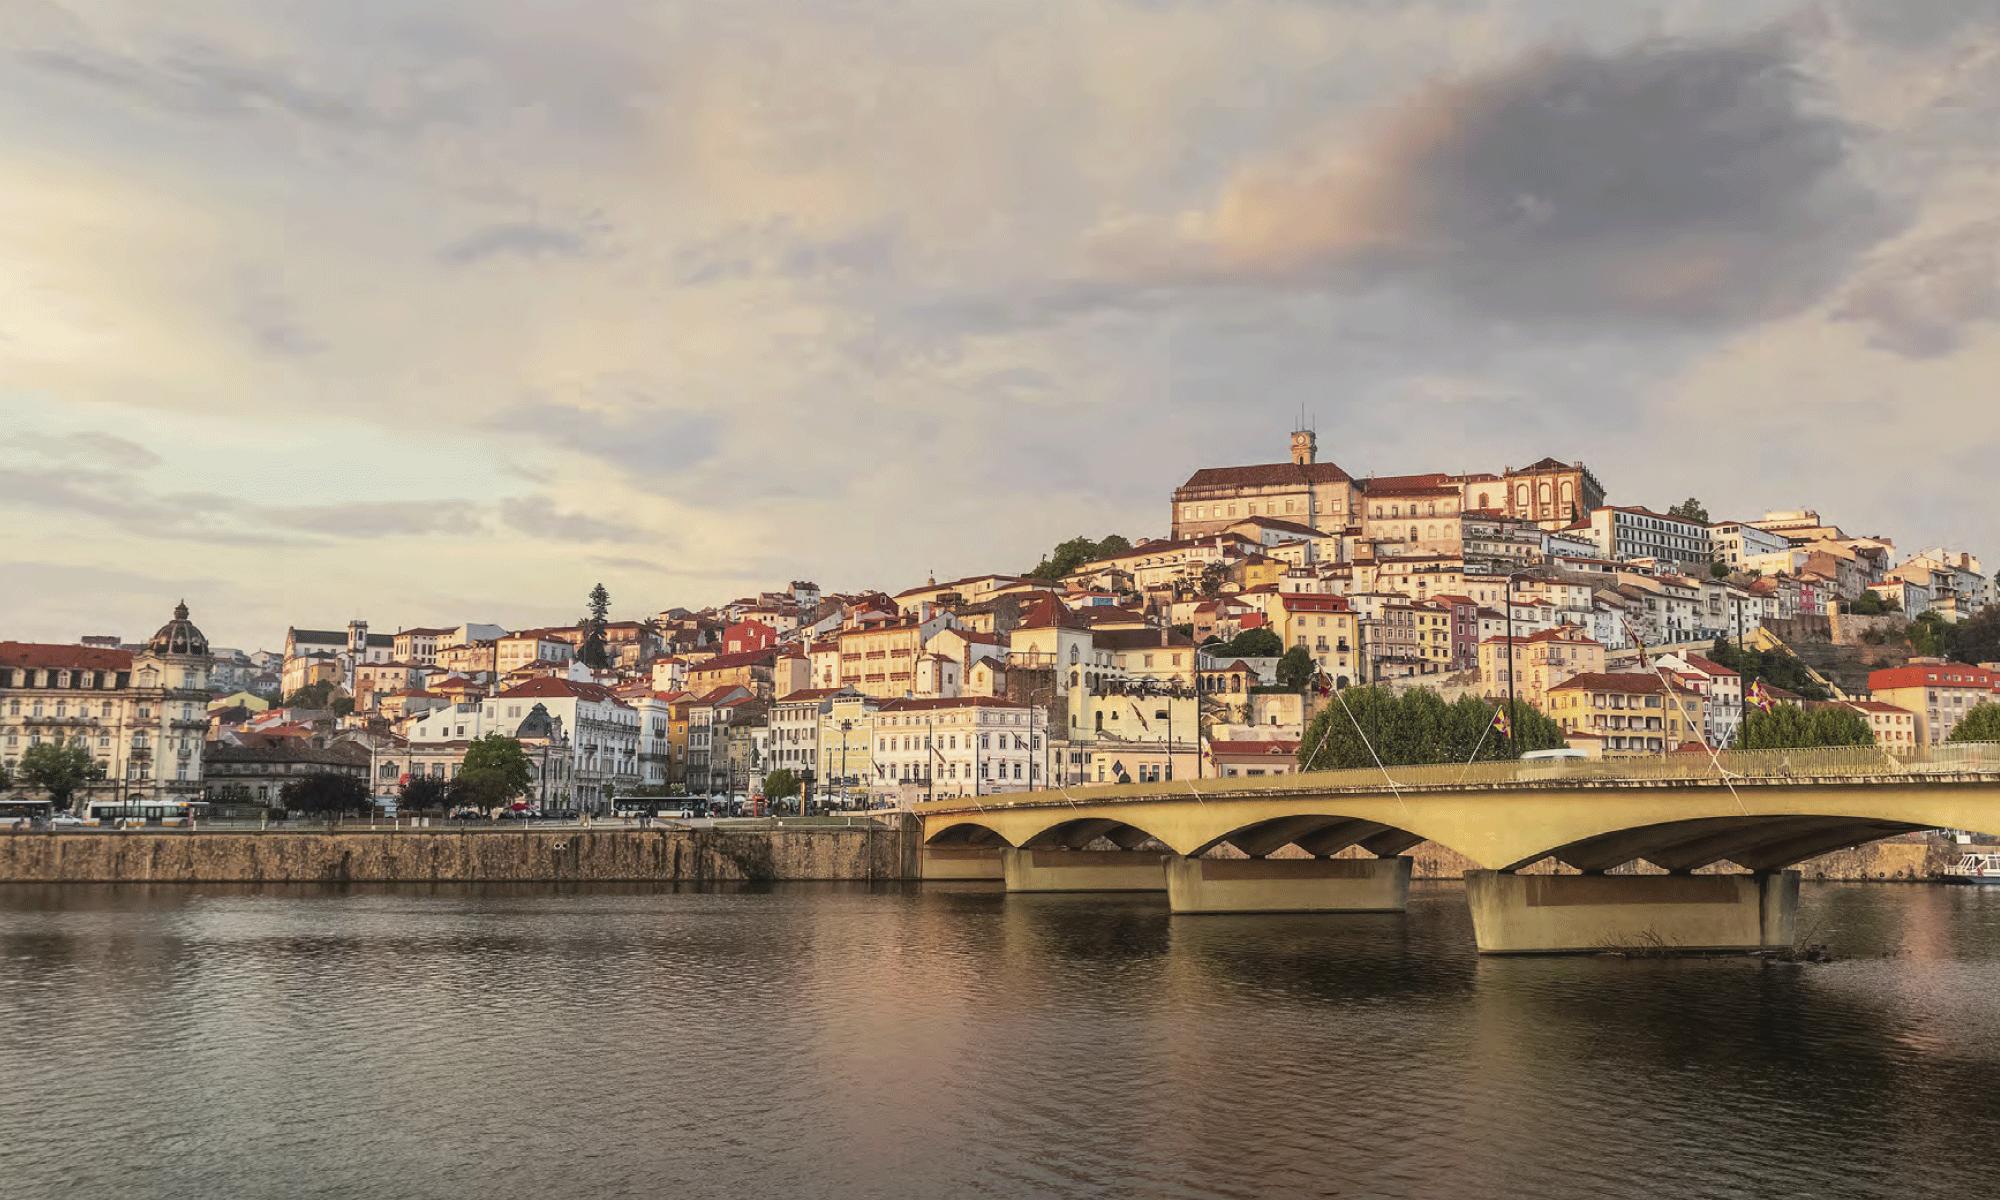 Smart_Metering_Referencia_2_Coimbra